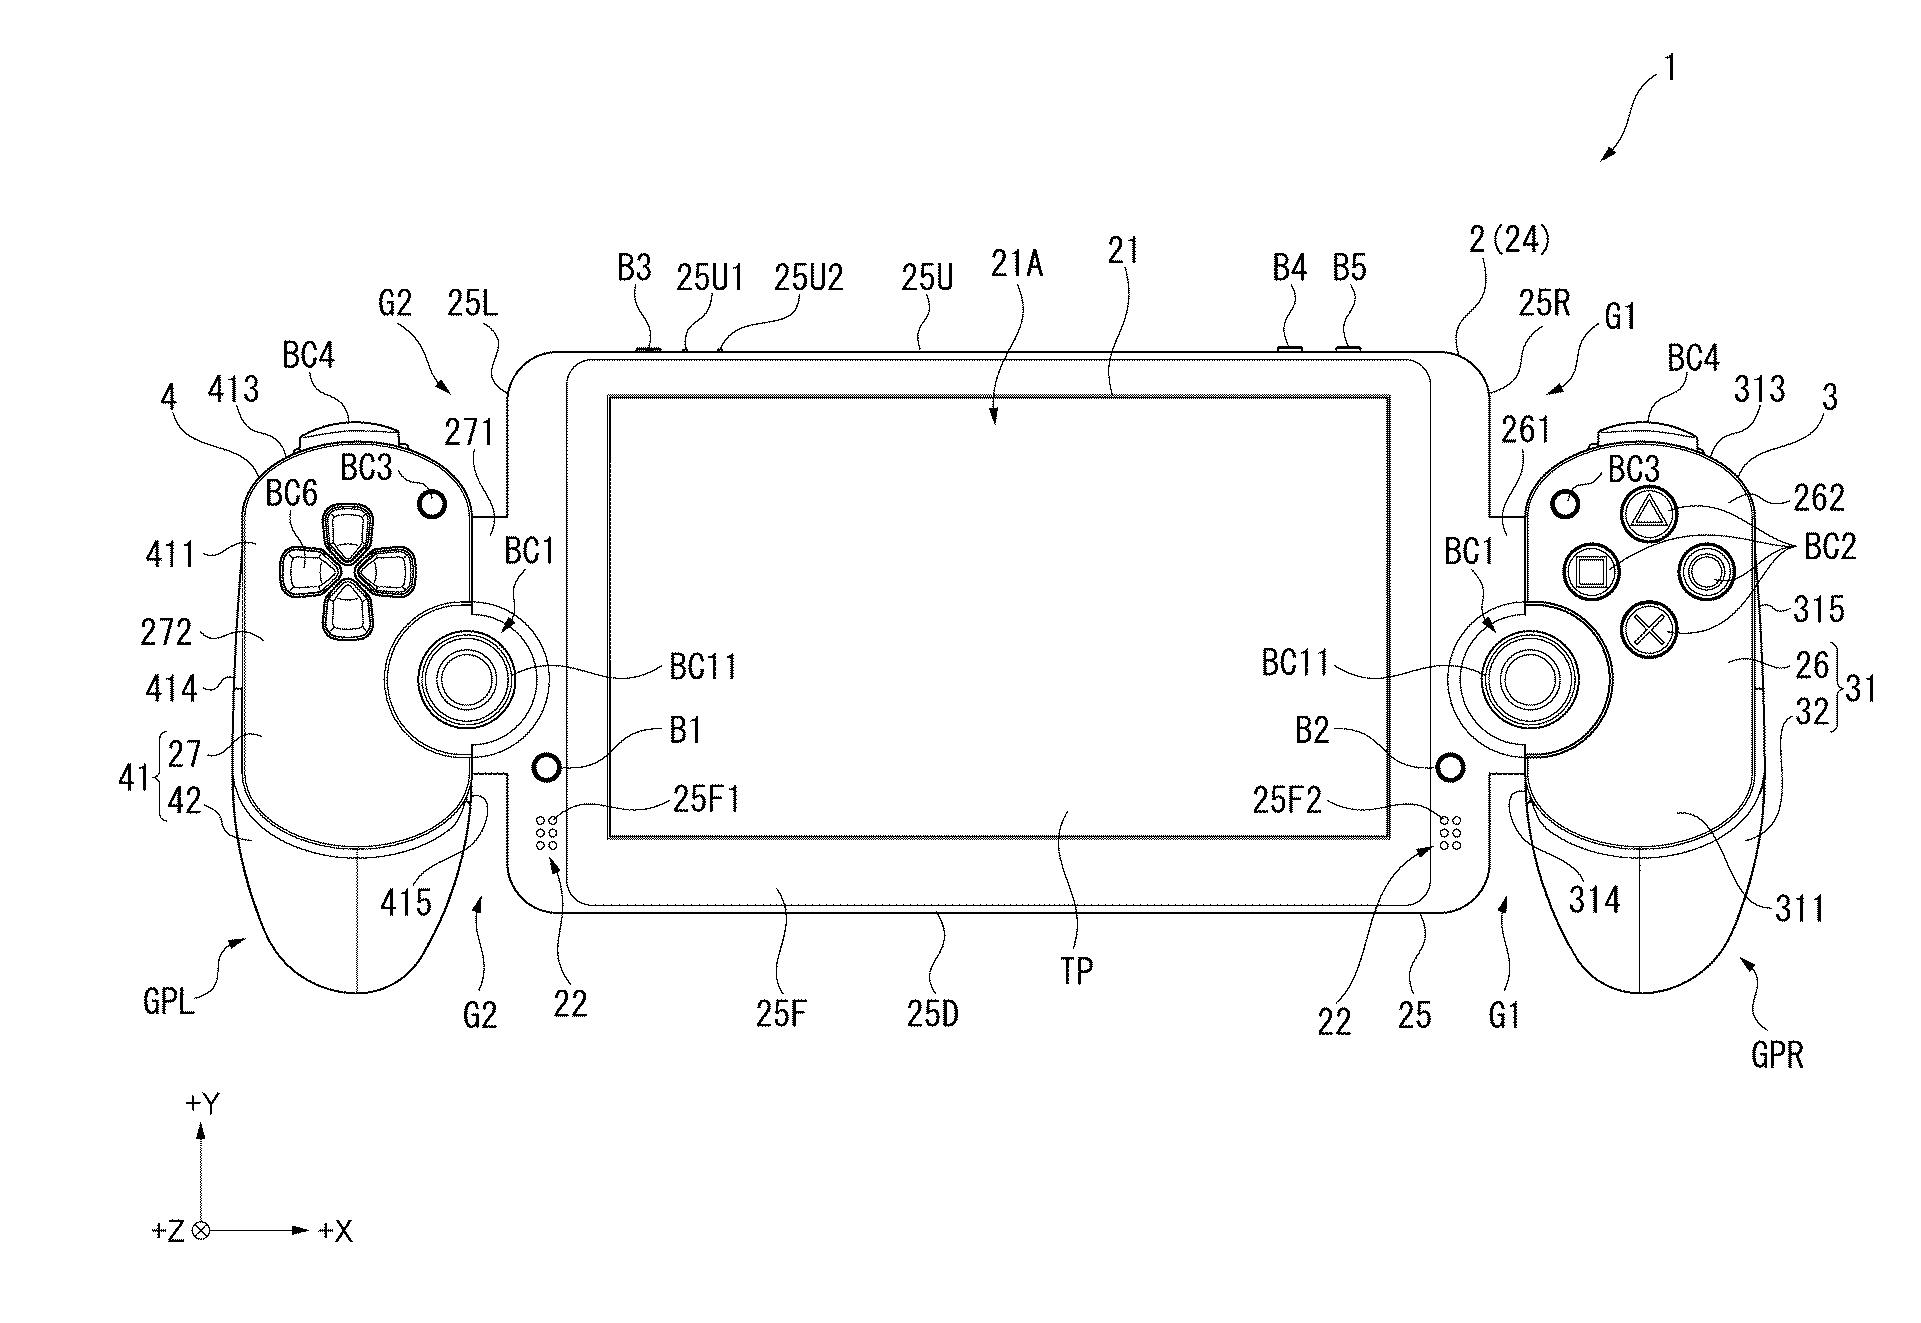 PlayStation Switch?